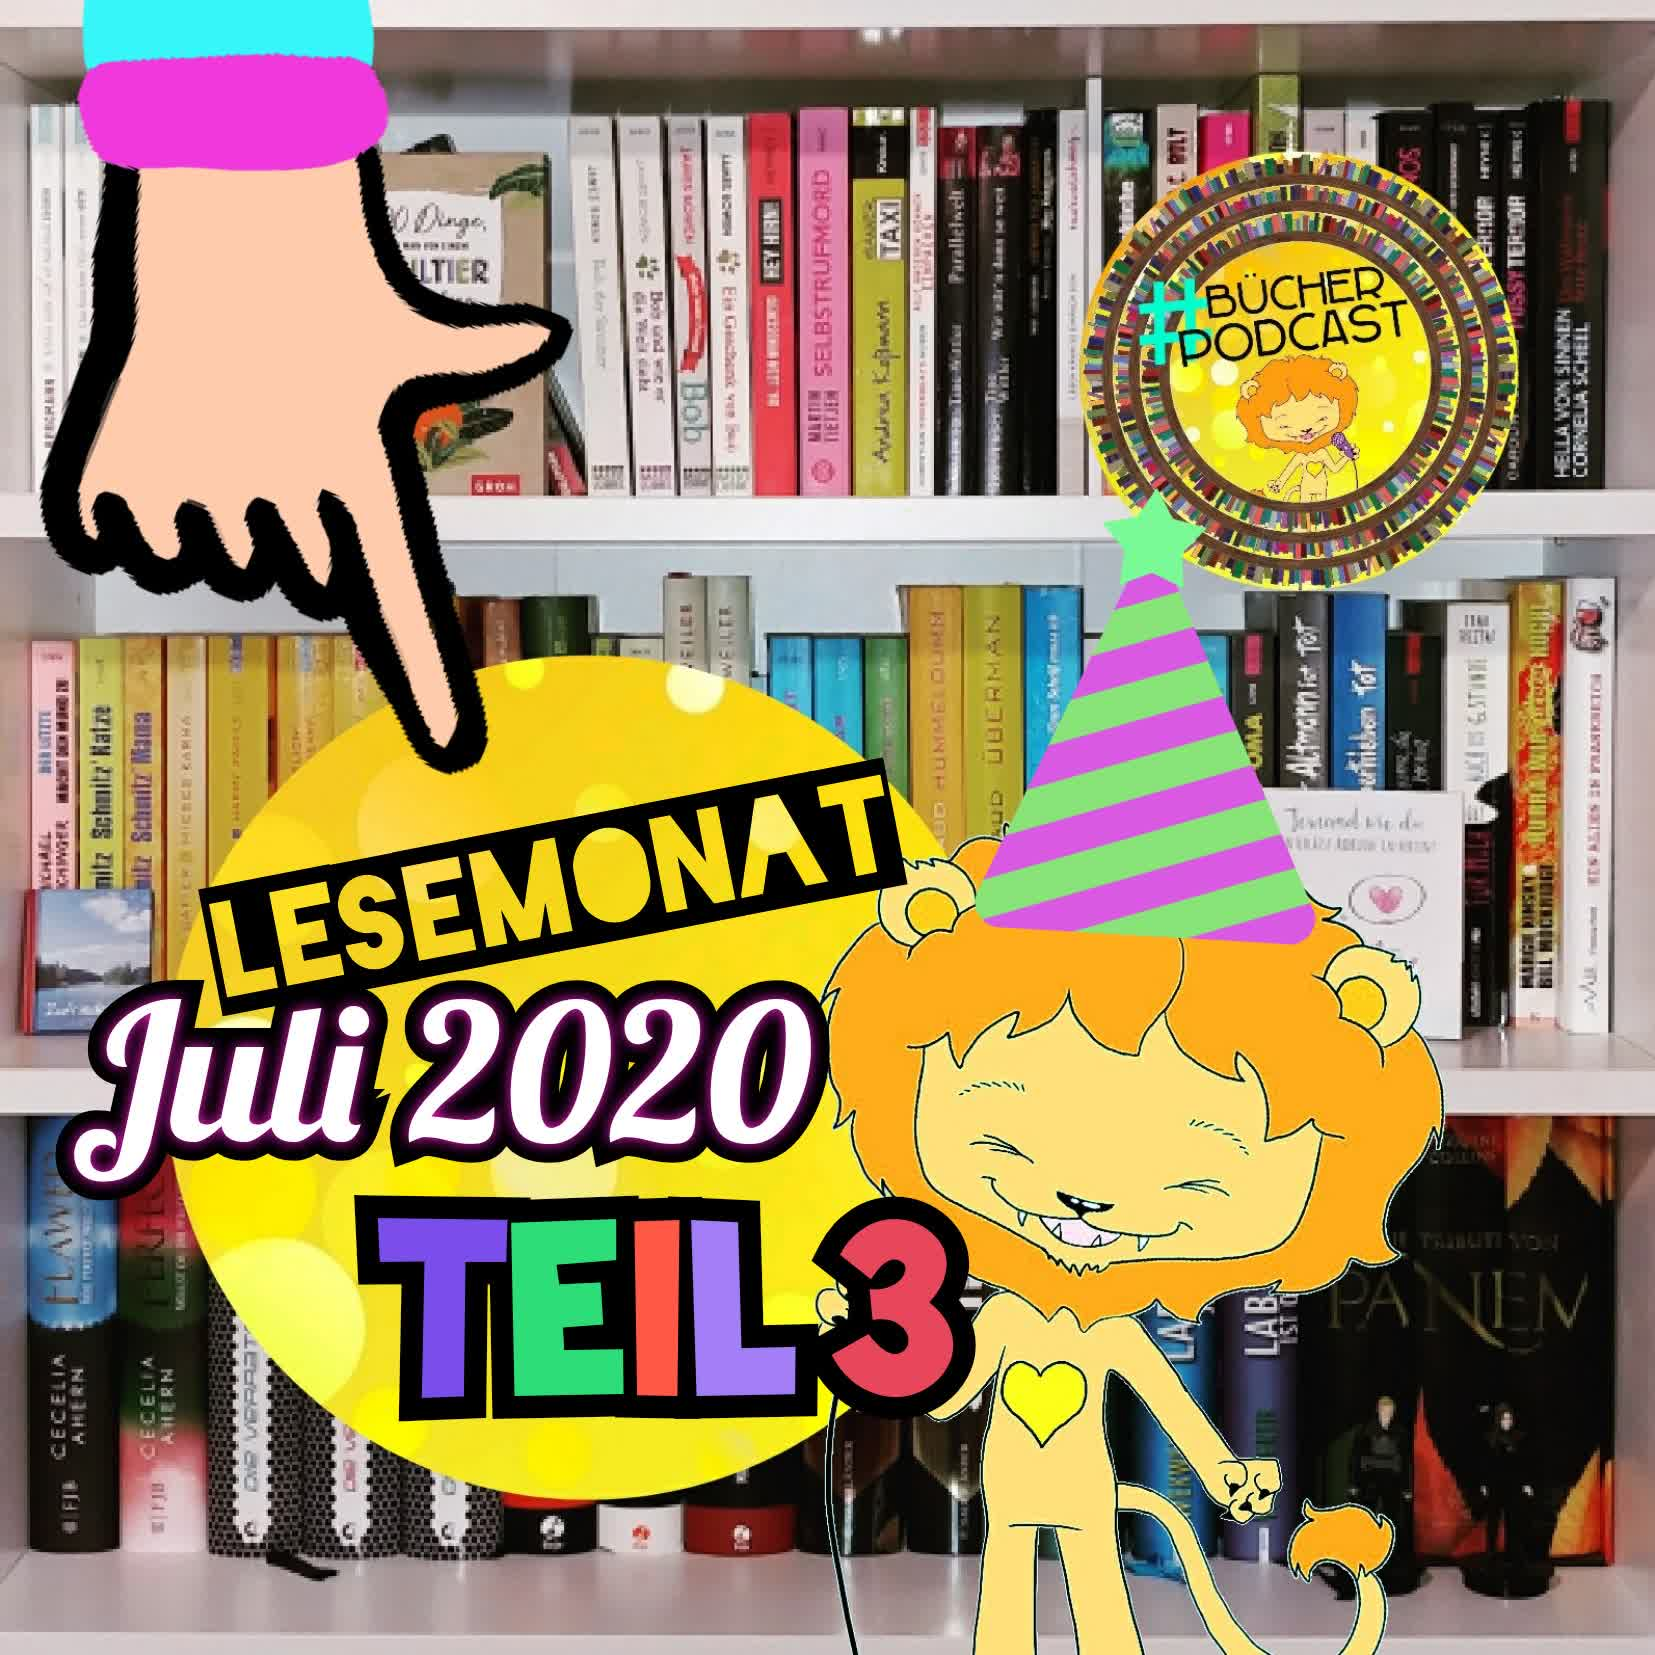 Lesemonat Juli 2020 - Teil 3